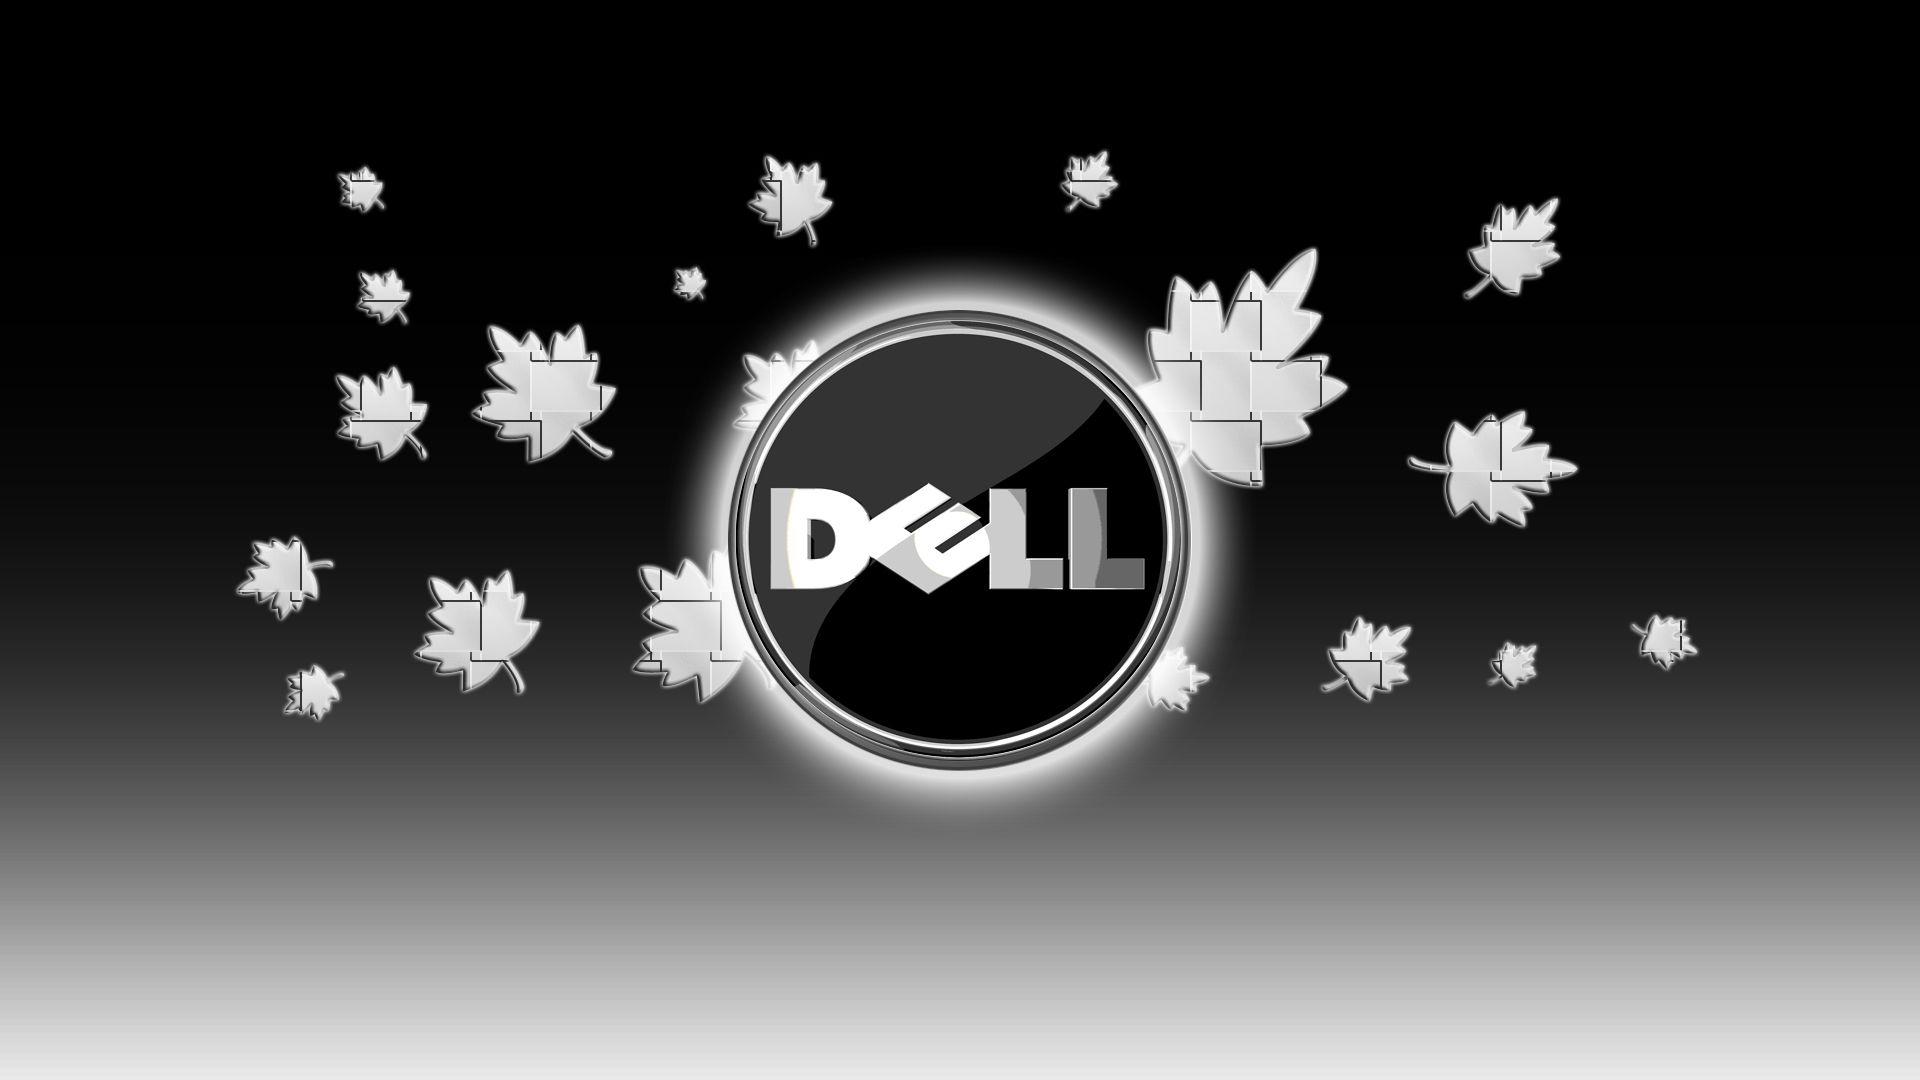 Dell 1080p background